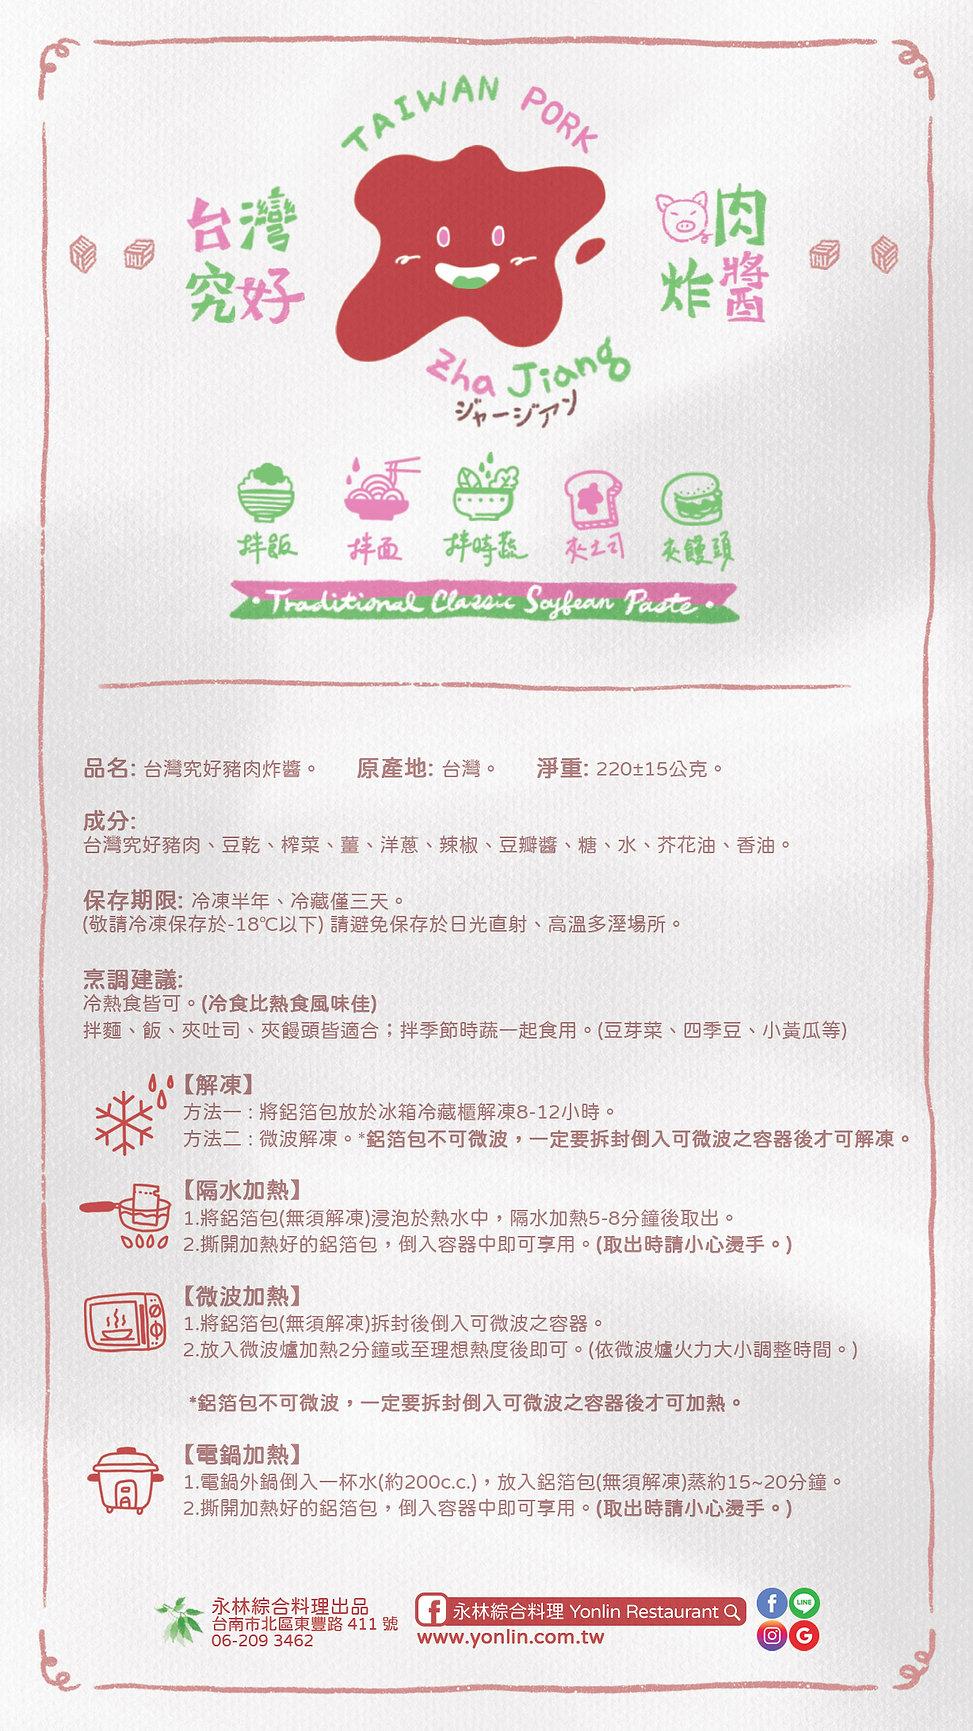 10x10cm-台灣究好豬肉炸醬-中文-詳細說明.jpg